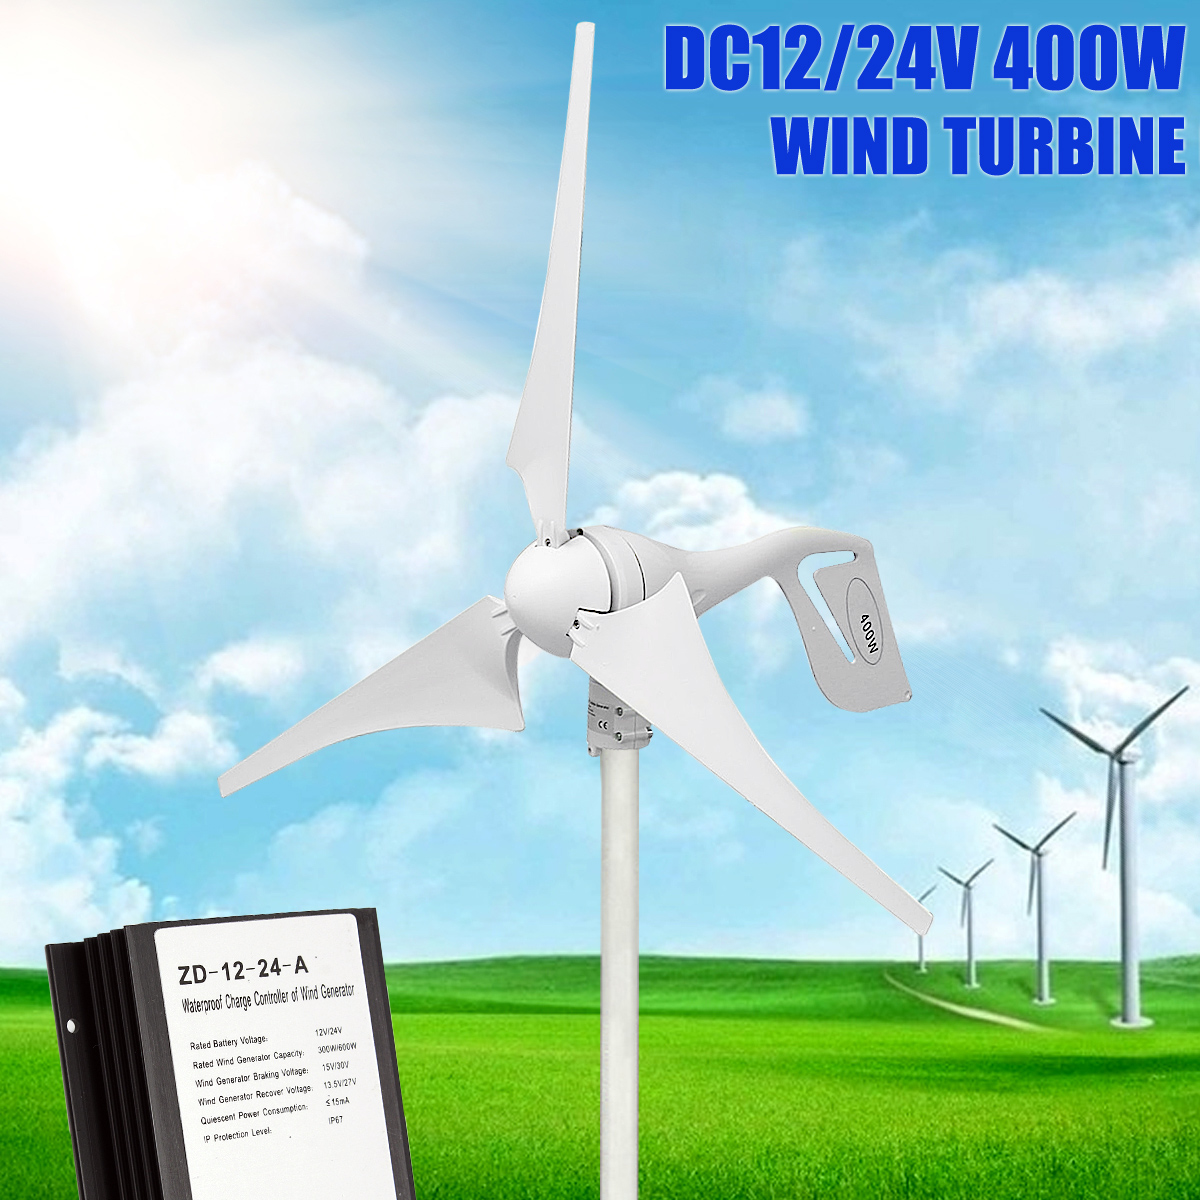 800/MINRPM 400 W turbina de viento generador DC 12 V/24 V 3 hoja con regulador de carga impermeable blanco